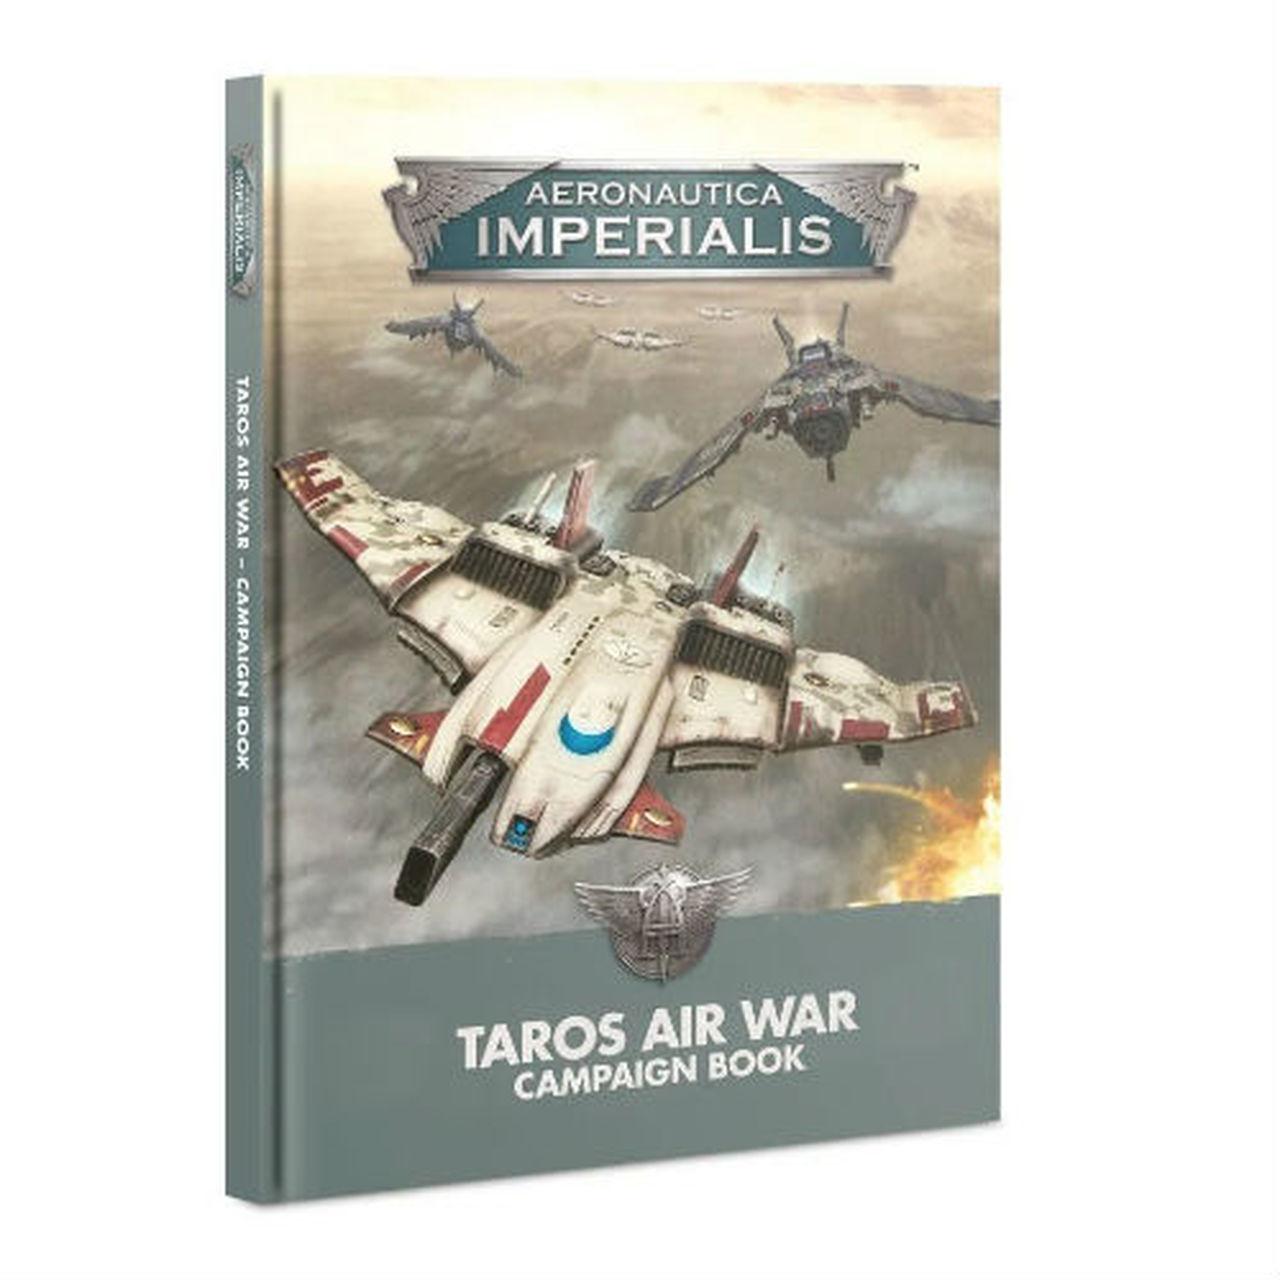 Aeronautica Imperialis: Taros Air War Campaign Book